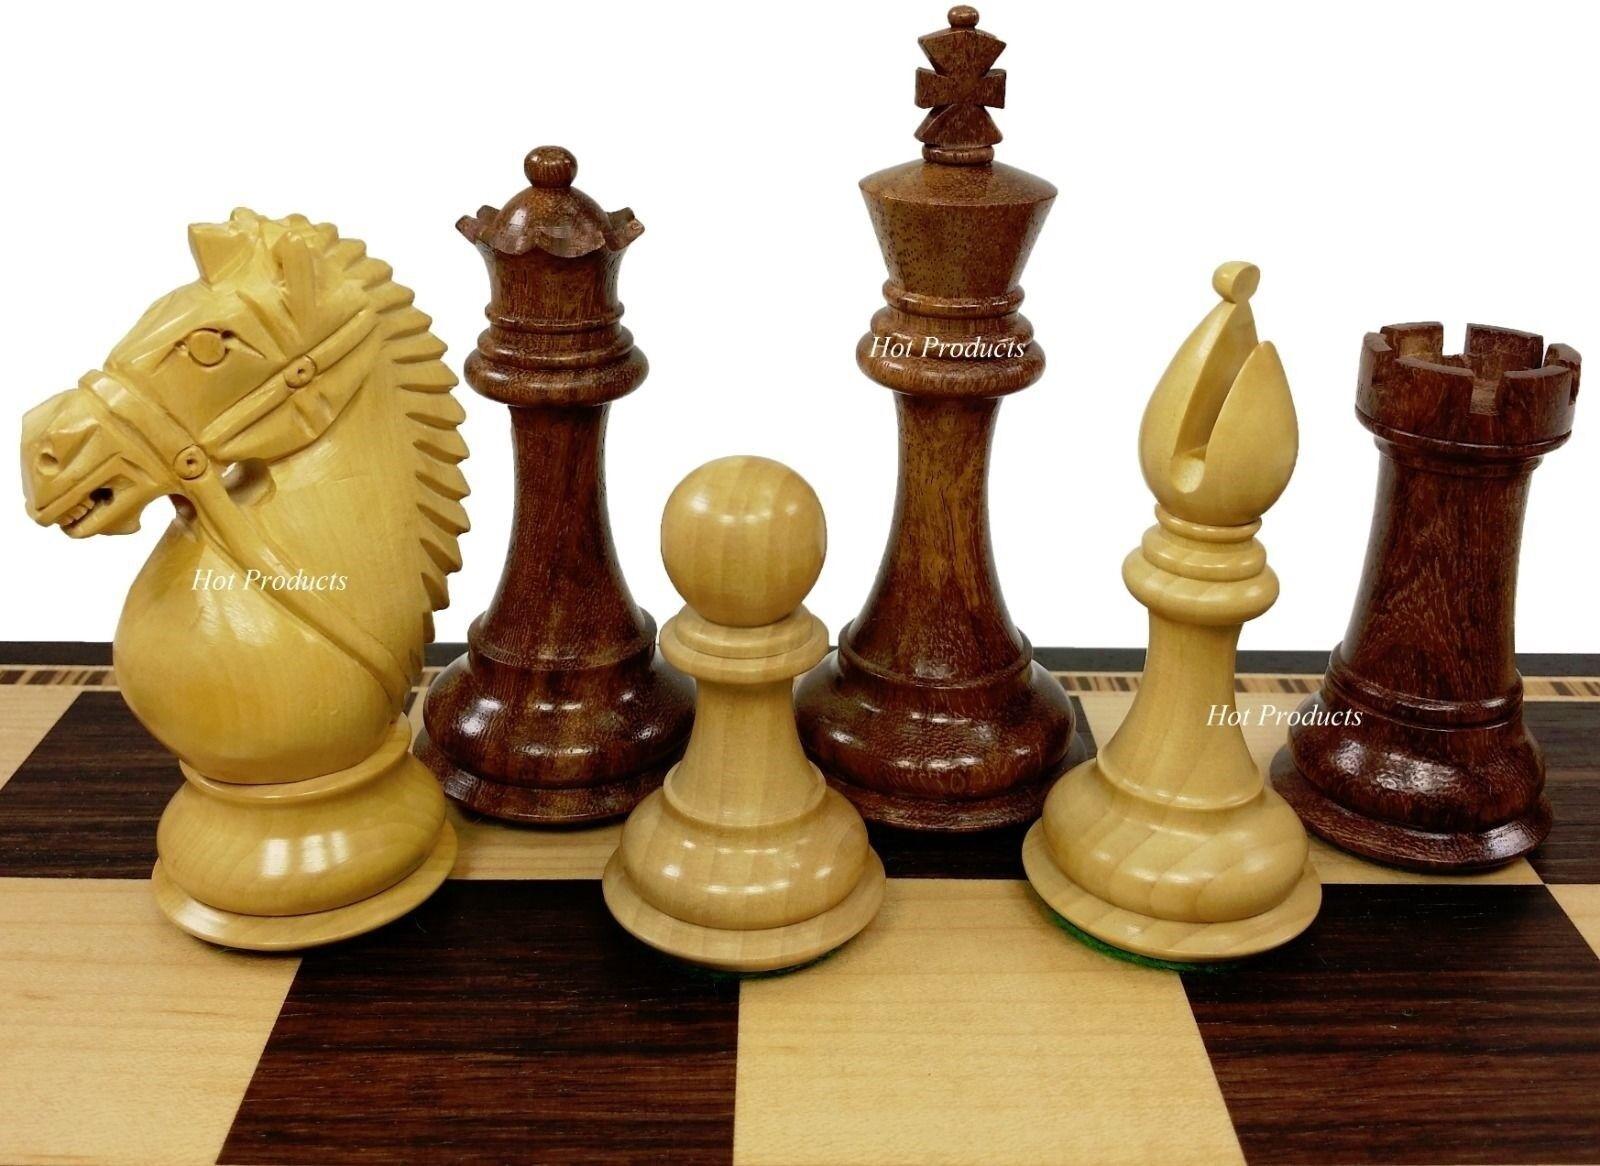 4 QUEENS - 4  King Staunton BRIDLED Knight SHEESHAM WOOD Chess Men Set -NO BOARD